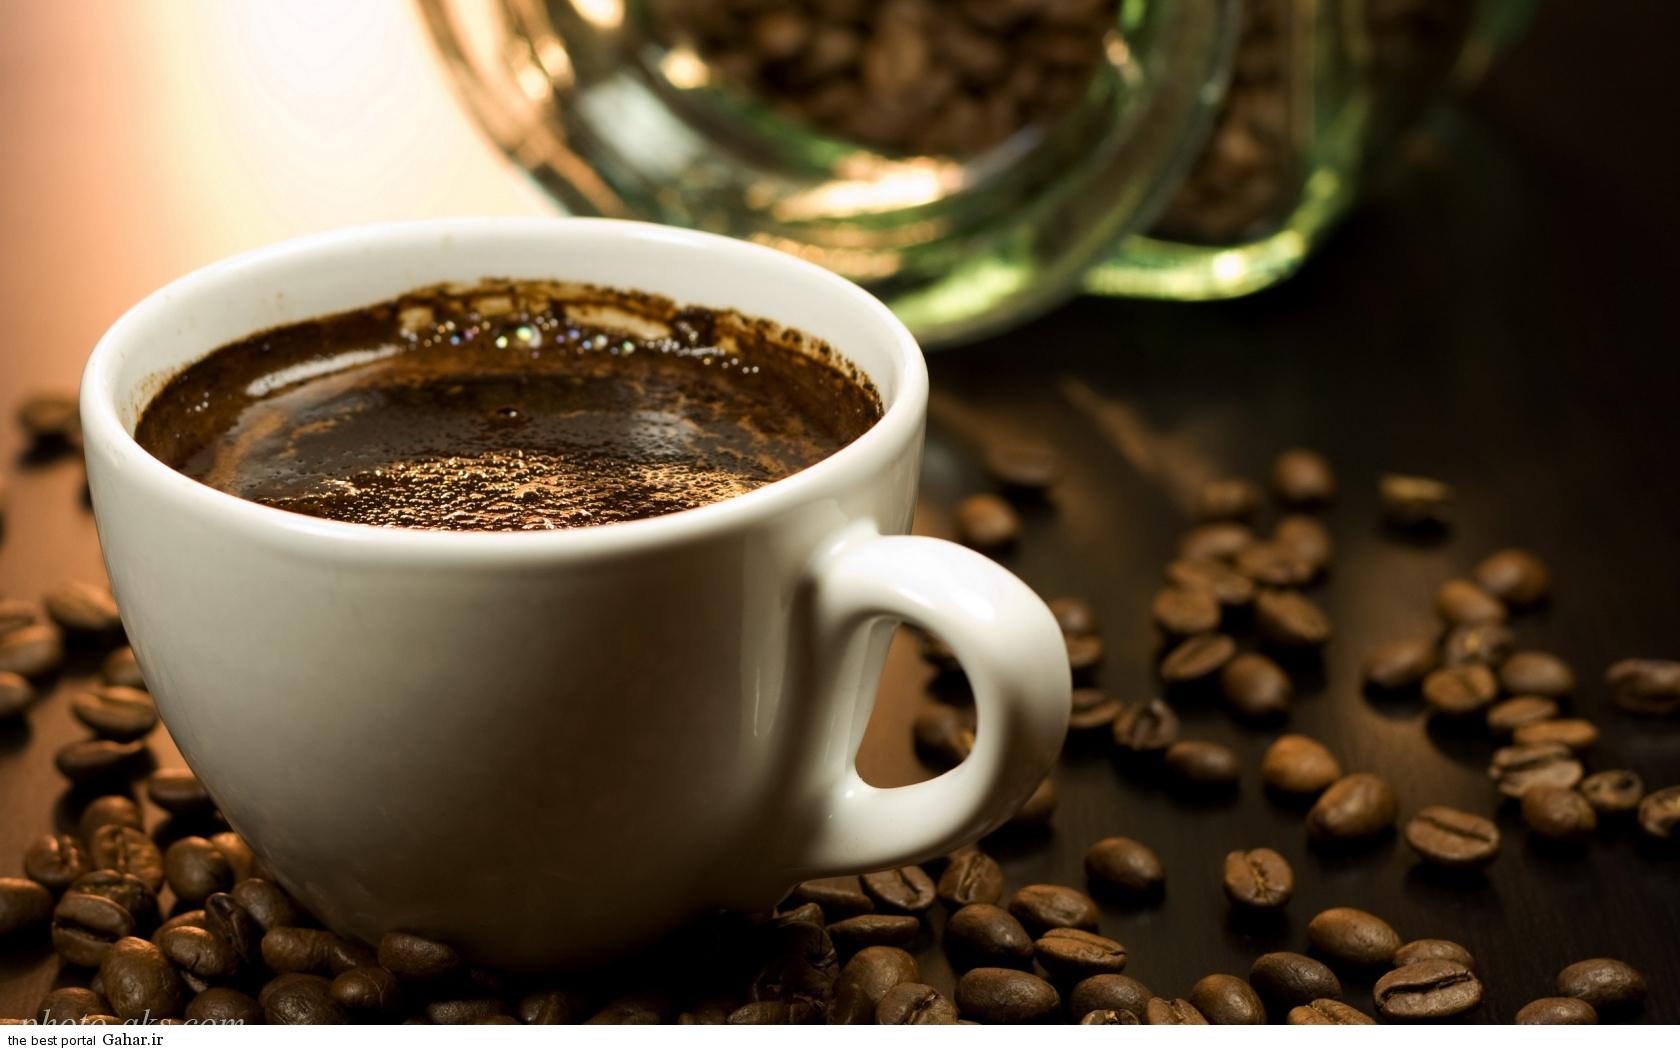 black coffeephoto aks.com  دارویی خوشمزه برای کنترل سرطان سینه